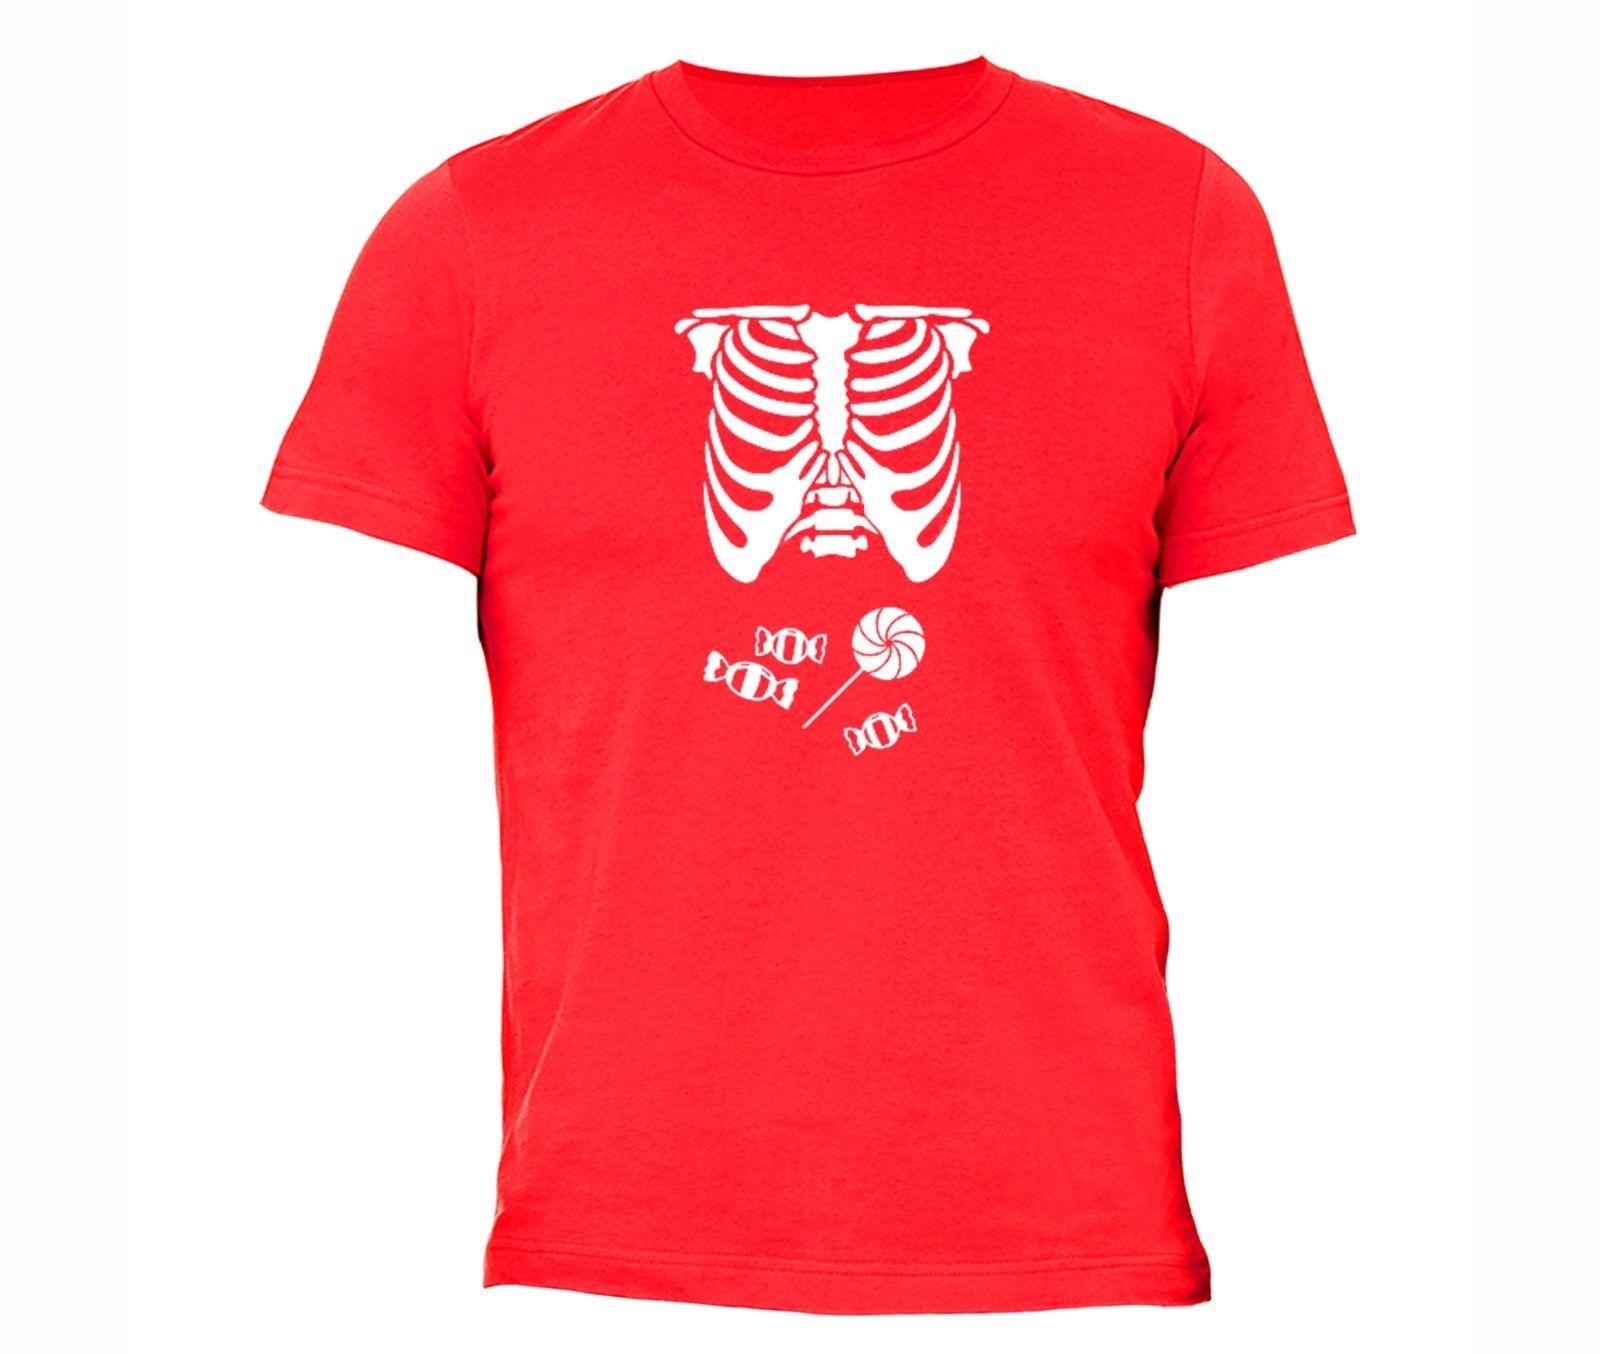 18a7fa8bb8b Halloween T Shirt Skull Skeleton Costume Jack O Lantern Day Of Dead Muertos  Tee Short Sleeve Plus Size T Shirt Colour Jersey Print T Shirt Buy Funny  Shirts ...